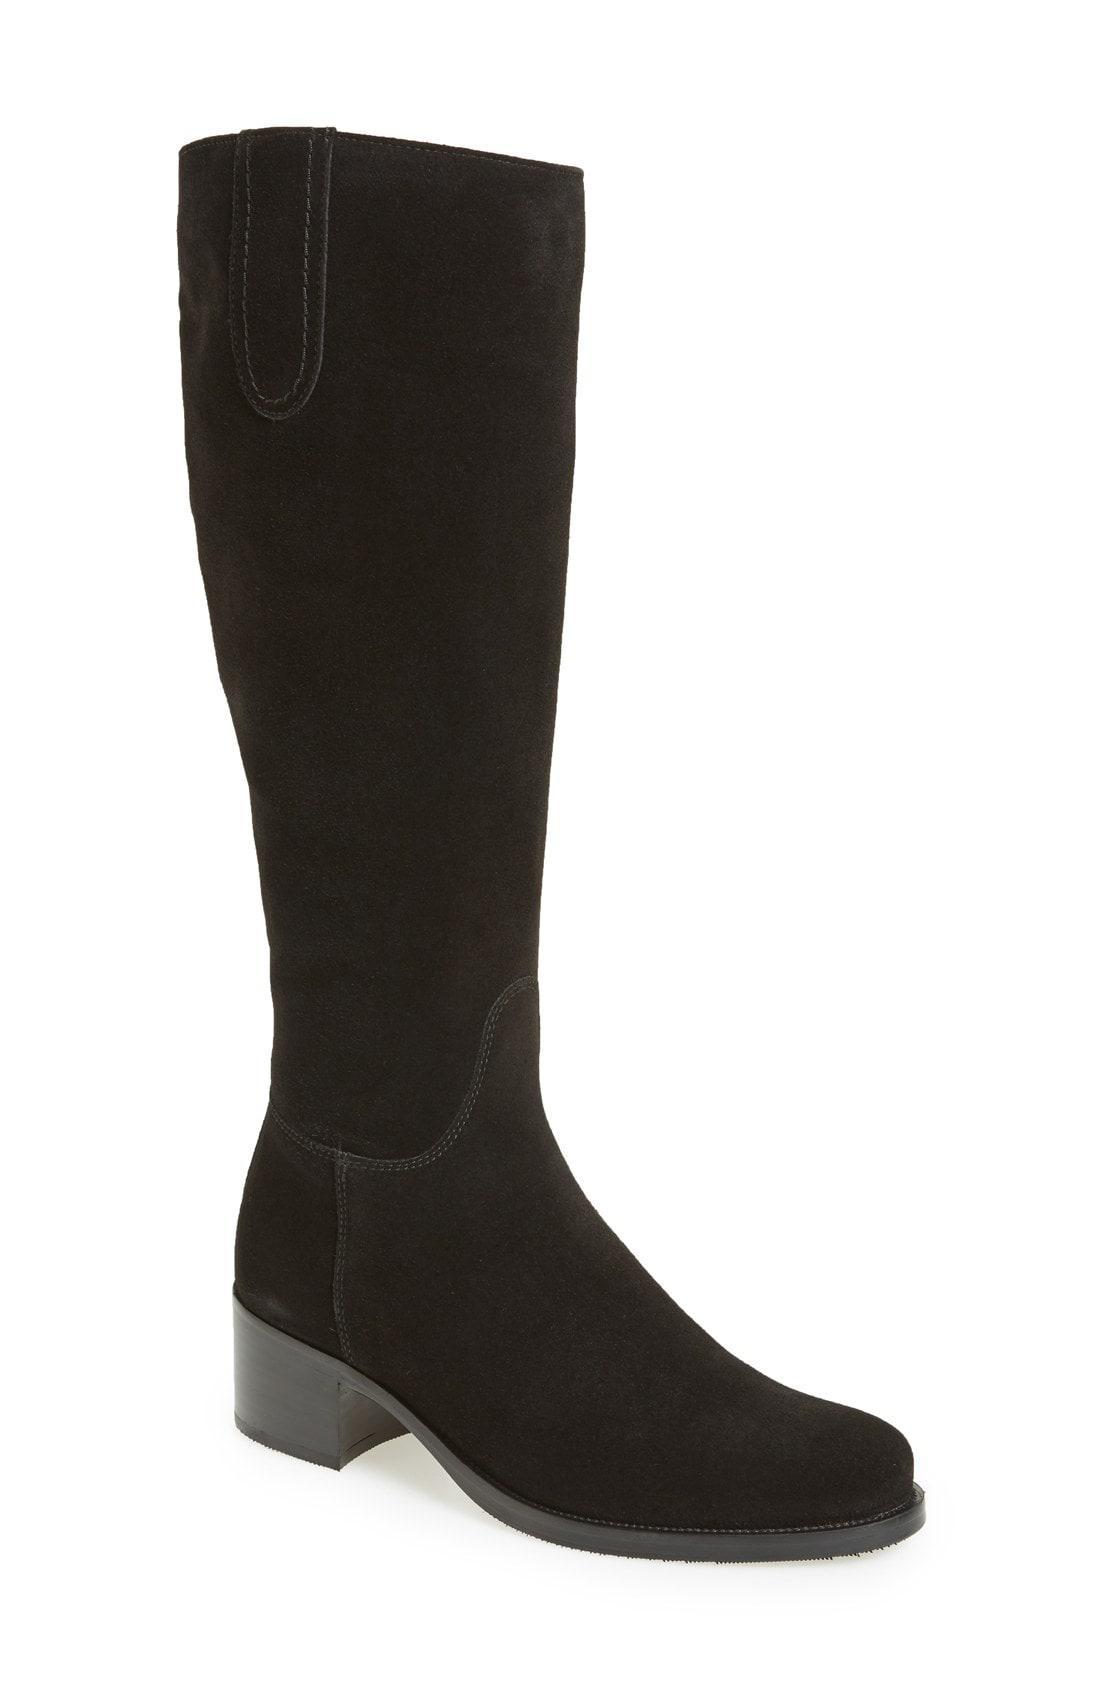 3074441744e La Canadienne  polly  Waterproof Knee High Boot in Black - Lyst